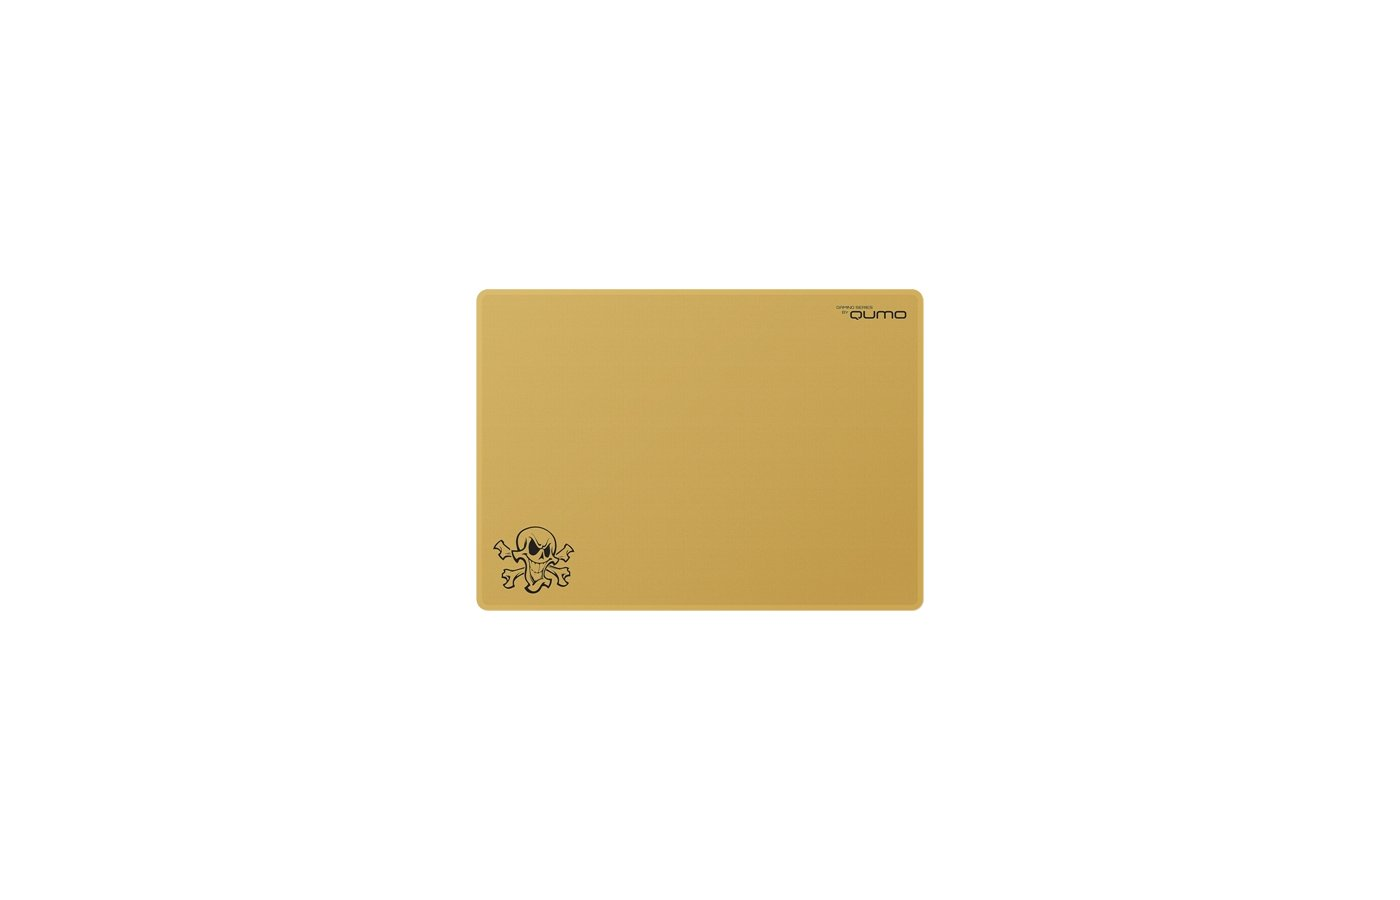 Коврик для мыши Qumo Dragon War Skull 320x230x1 золотой